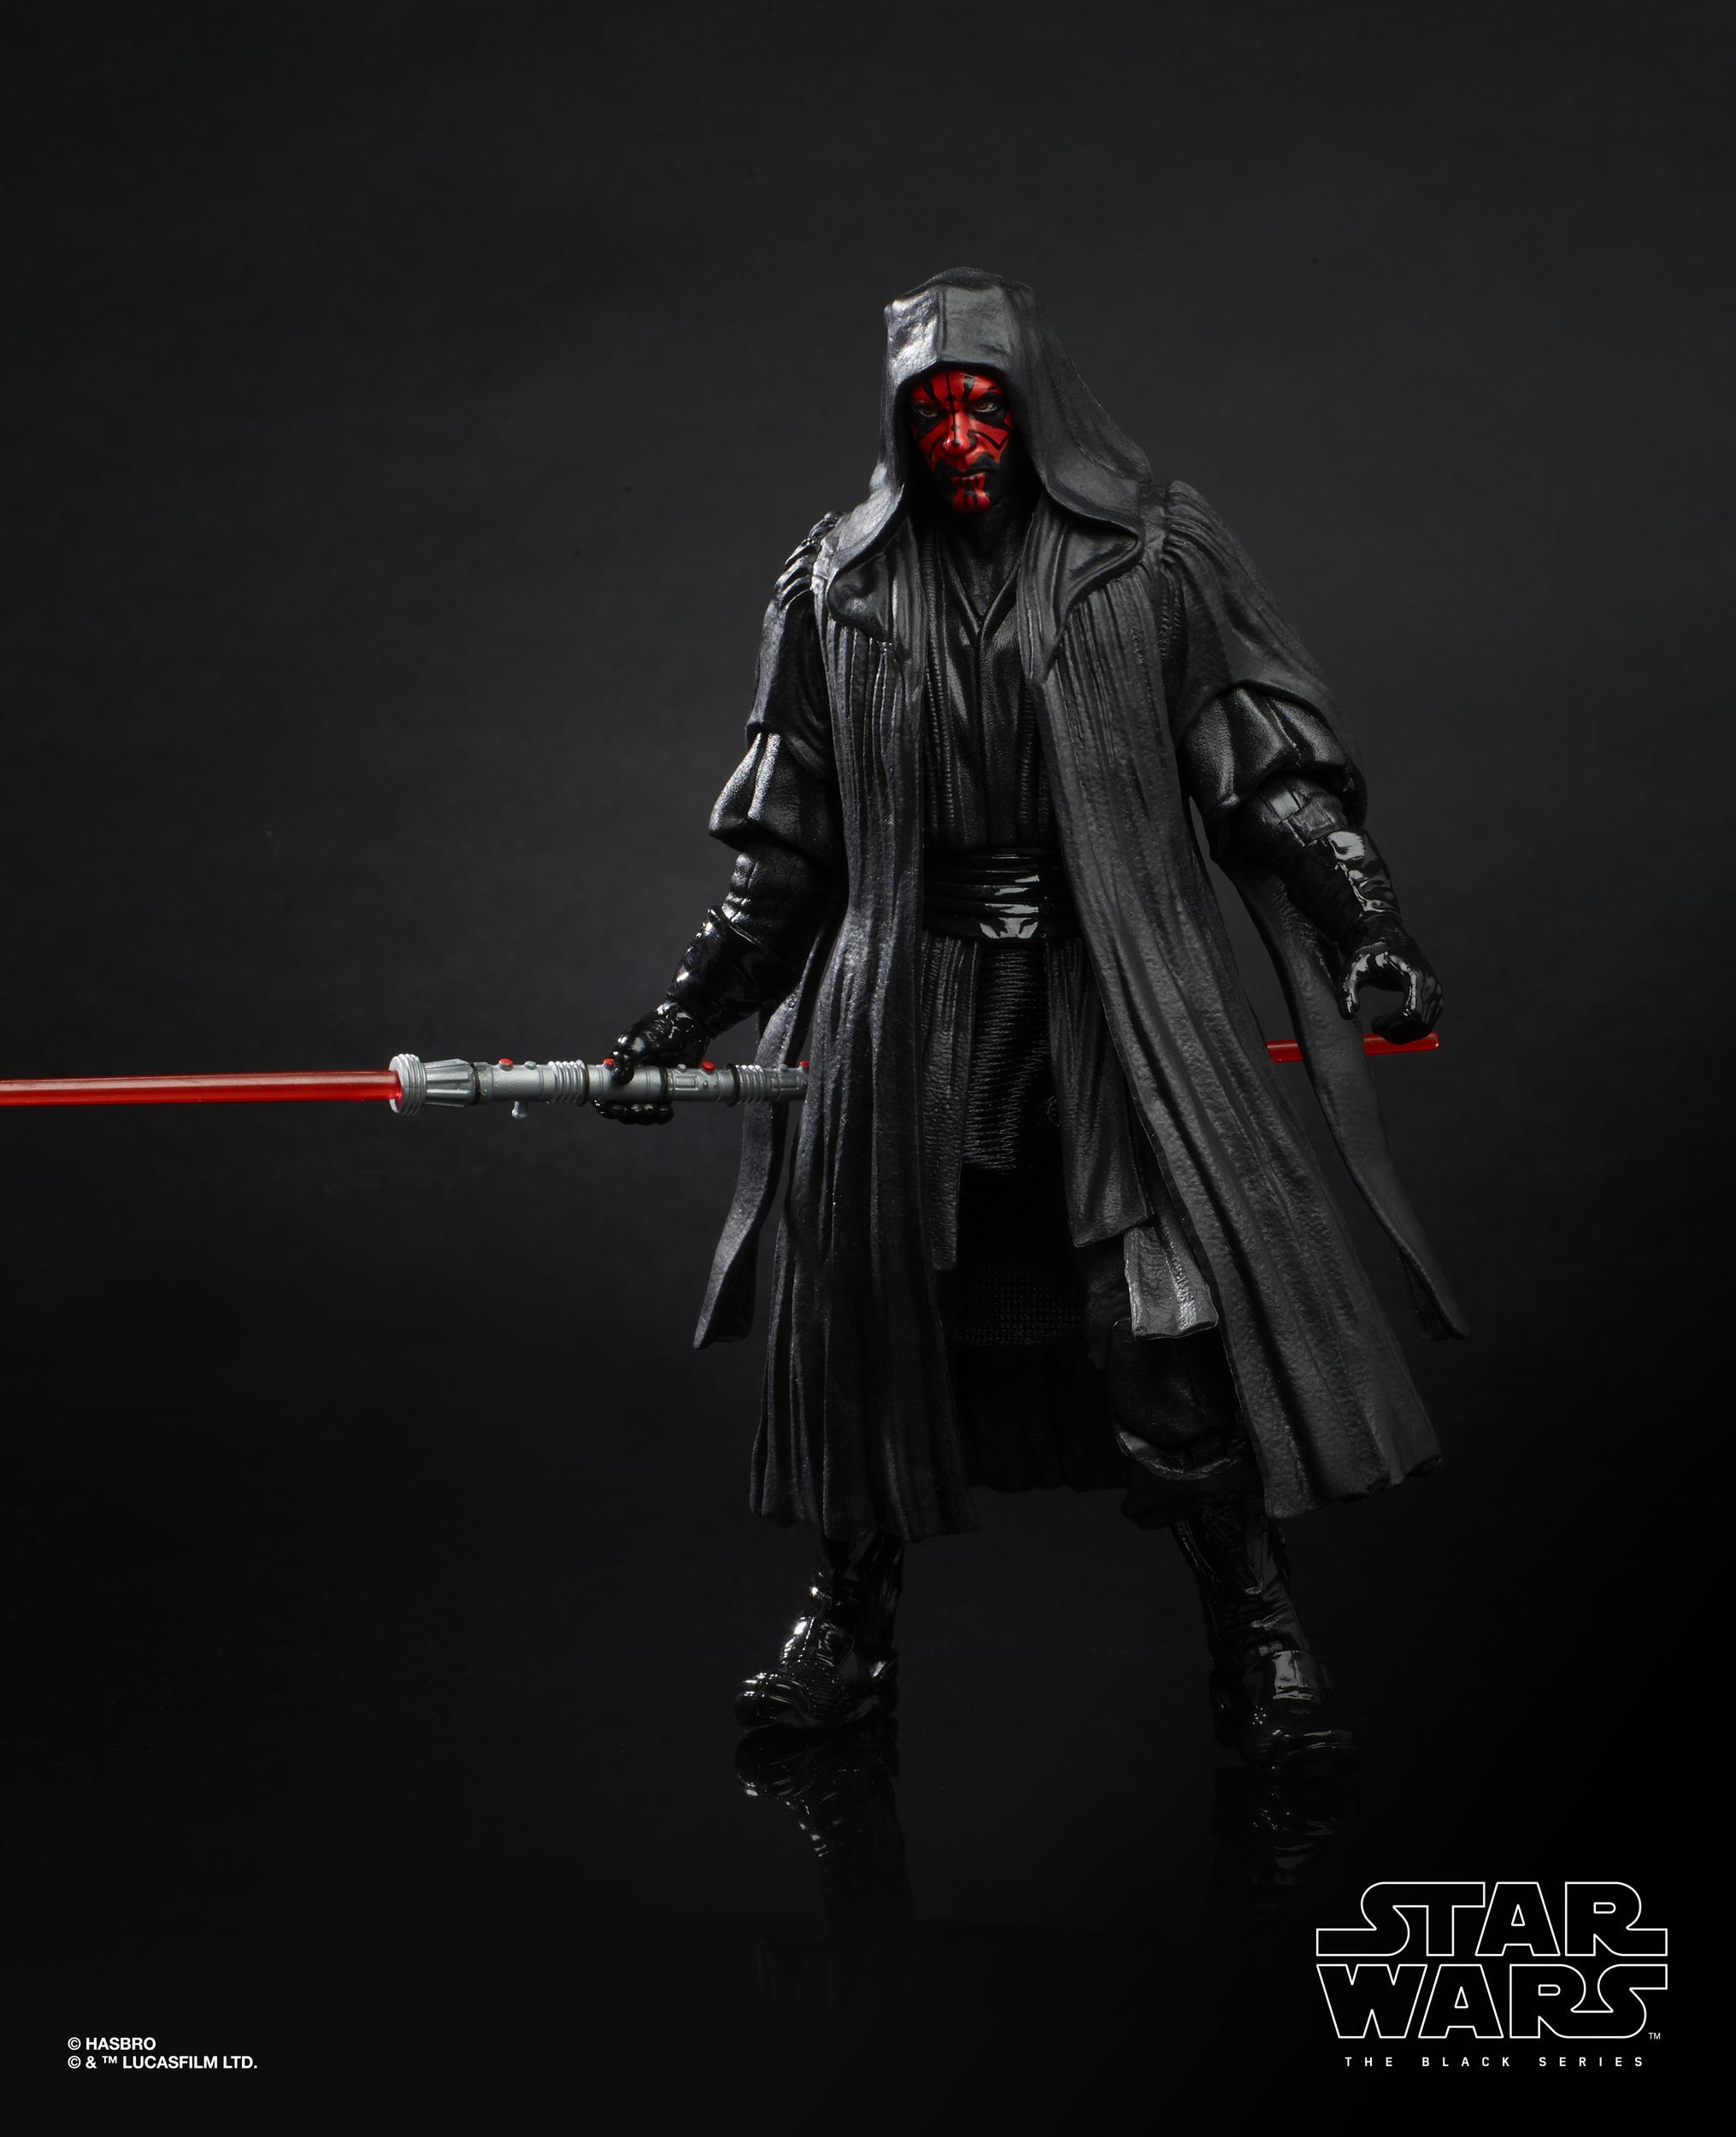 Dans la Main Star Wars Black Series Darth Maul Menace Fantôme 20th Anniversary Figure